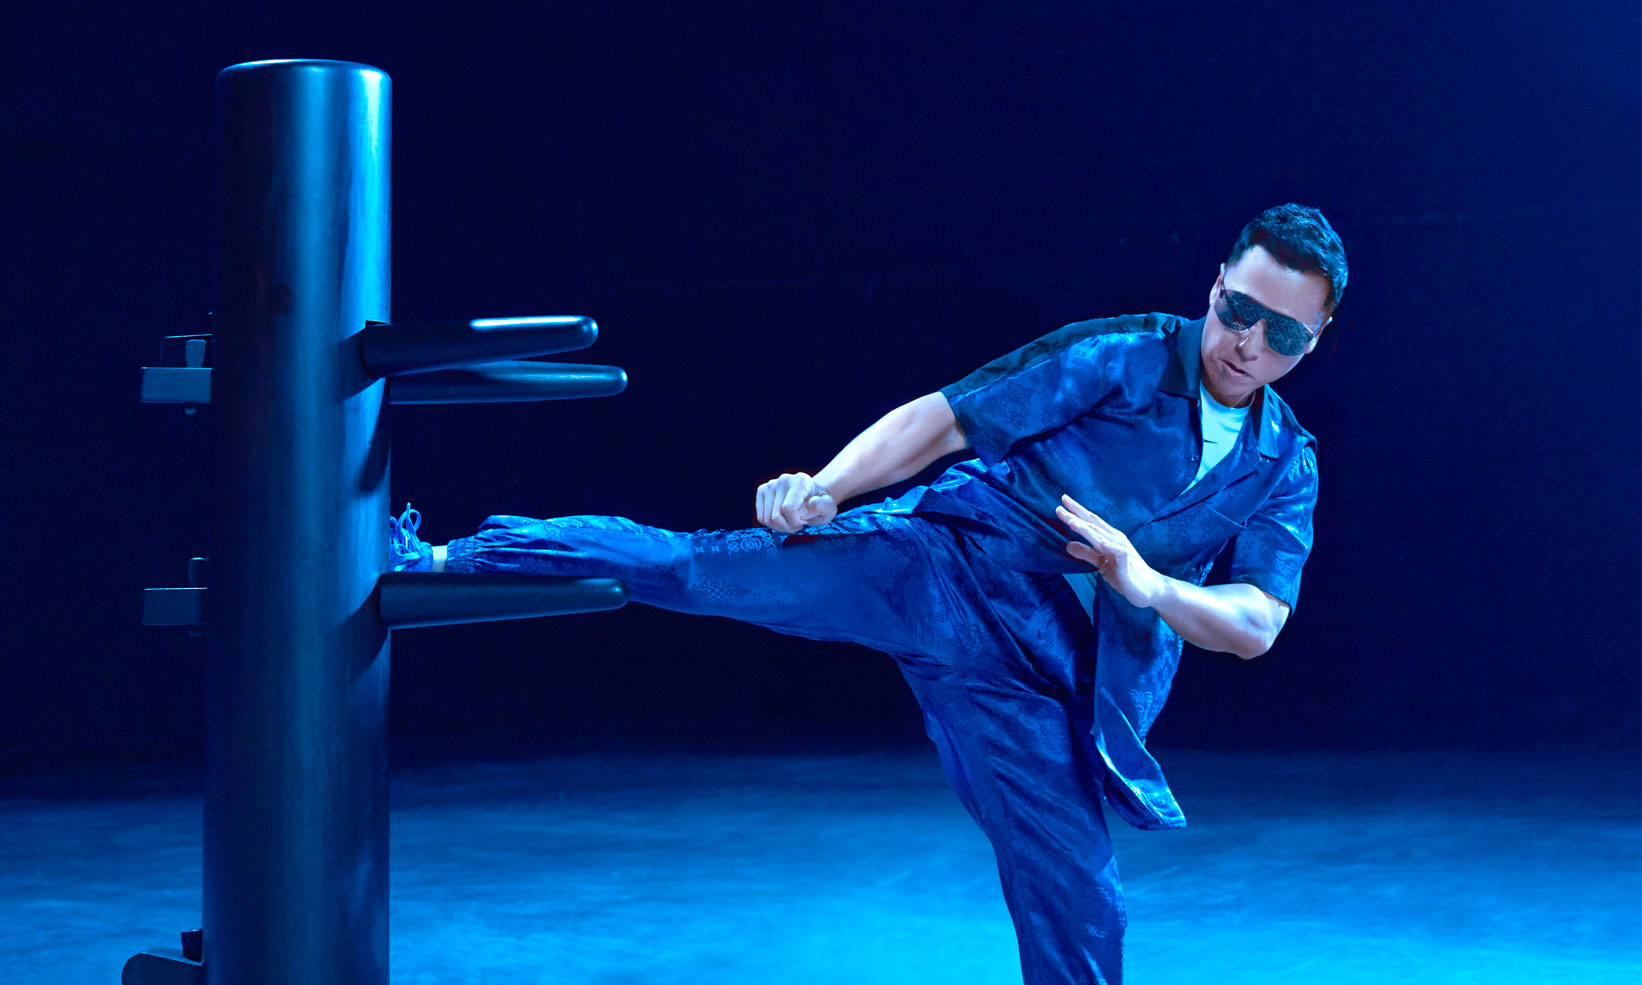 甄子丹演绎 CLOT x Nike 「Royale University Blue Silk」Air Force 1 蓝丝绸